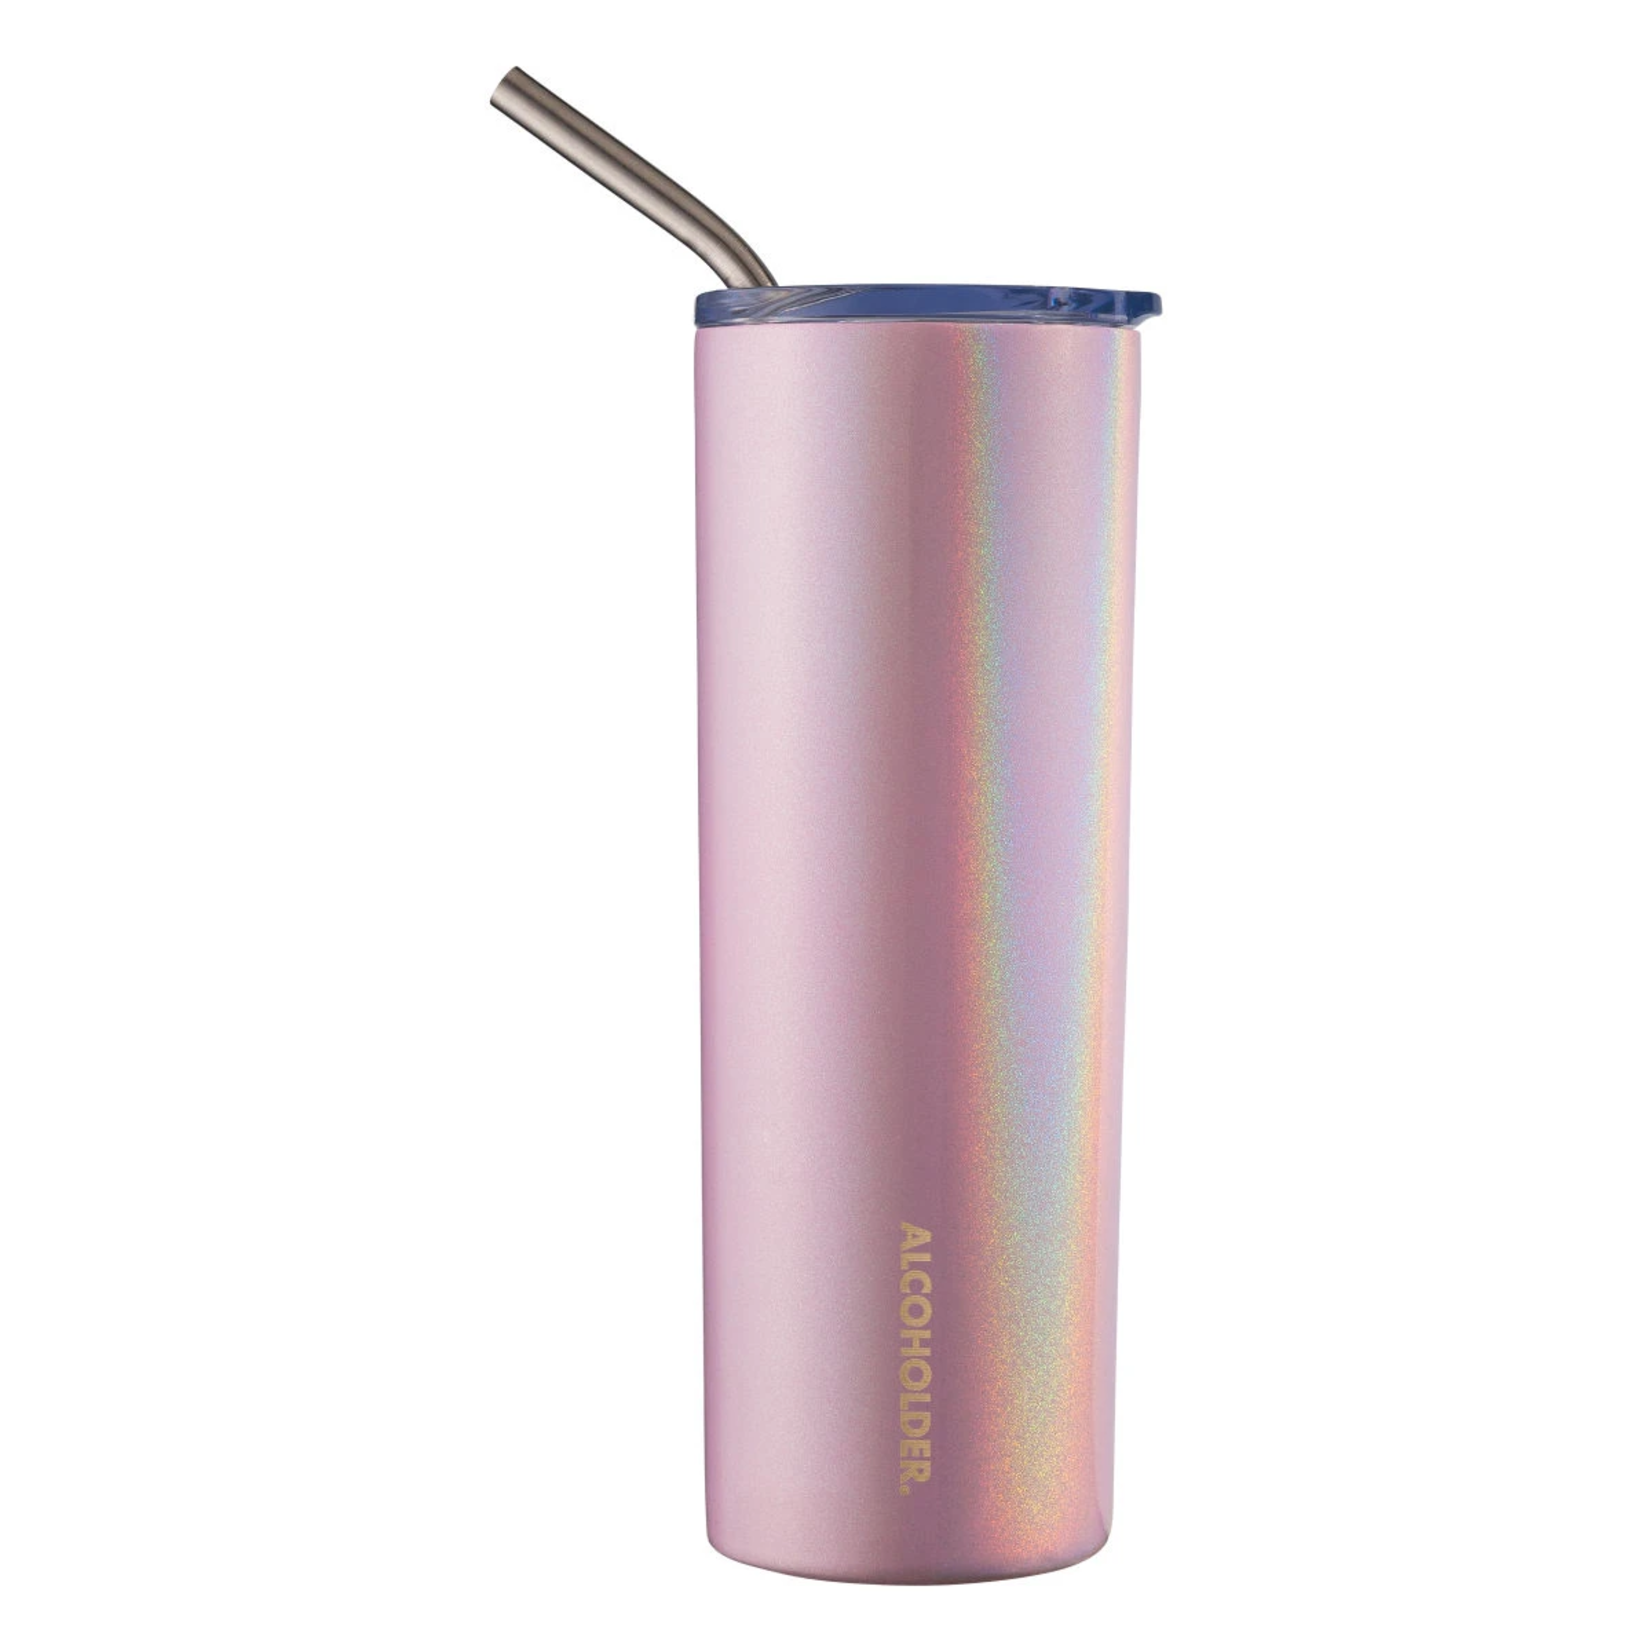 Alcoholder Alcoholder SKNY Slim Insulated Tumbler